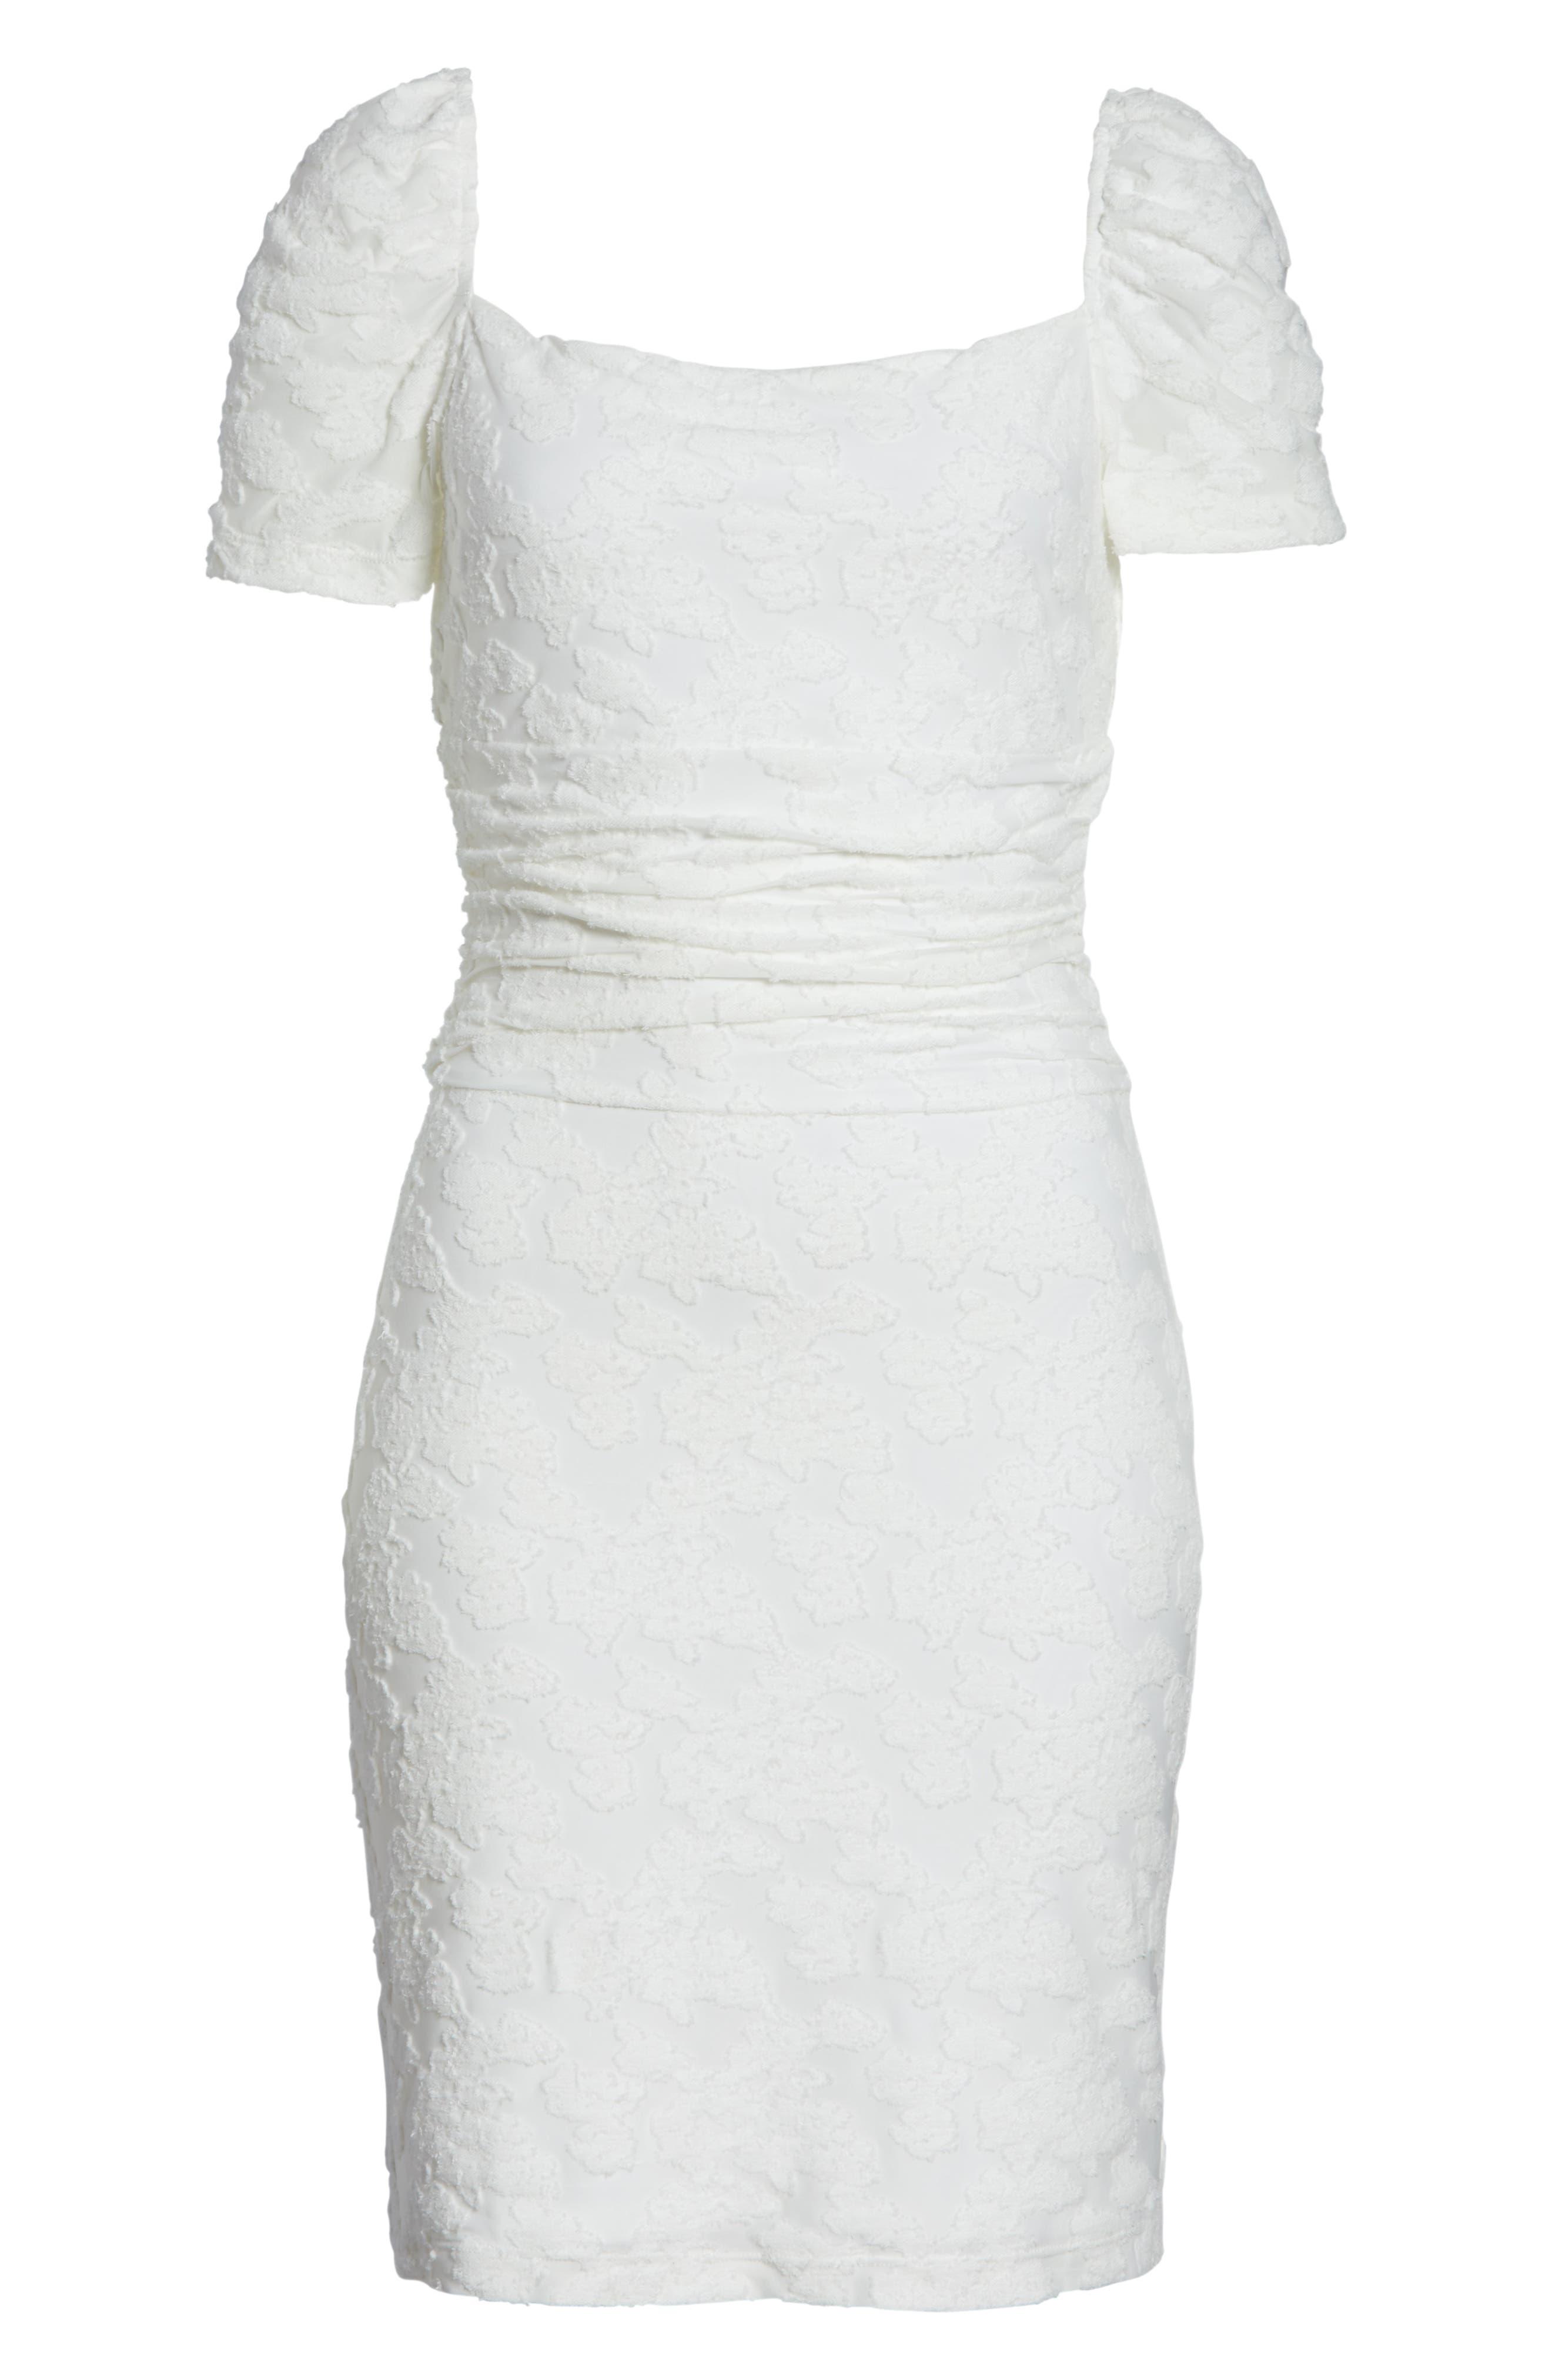 ALI & JAY, Big Mistake Short Sleeve Sheath Dress, Alternate thumbnail 7, color, WHITE FLORAL